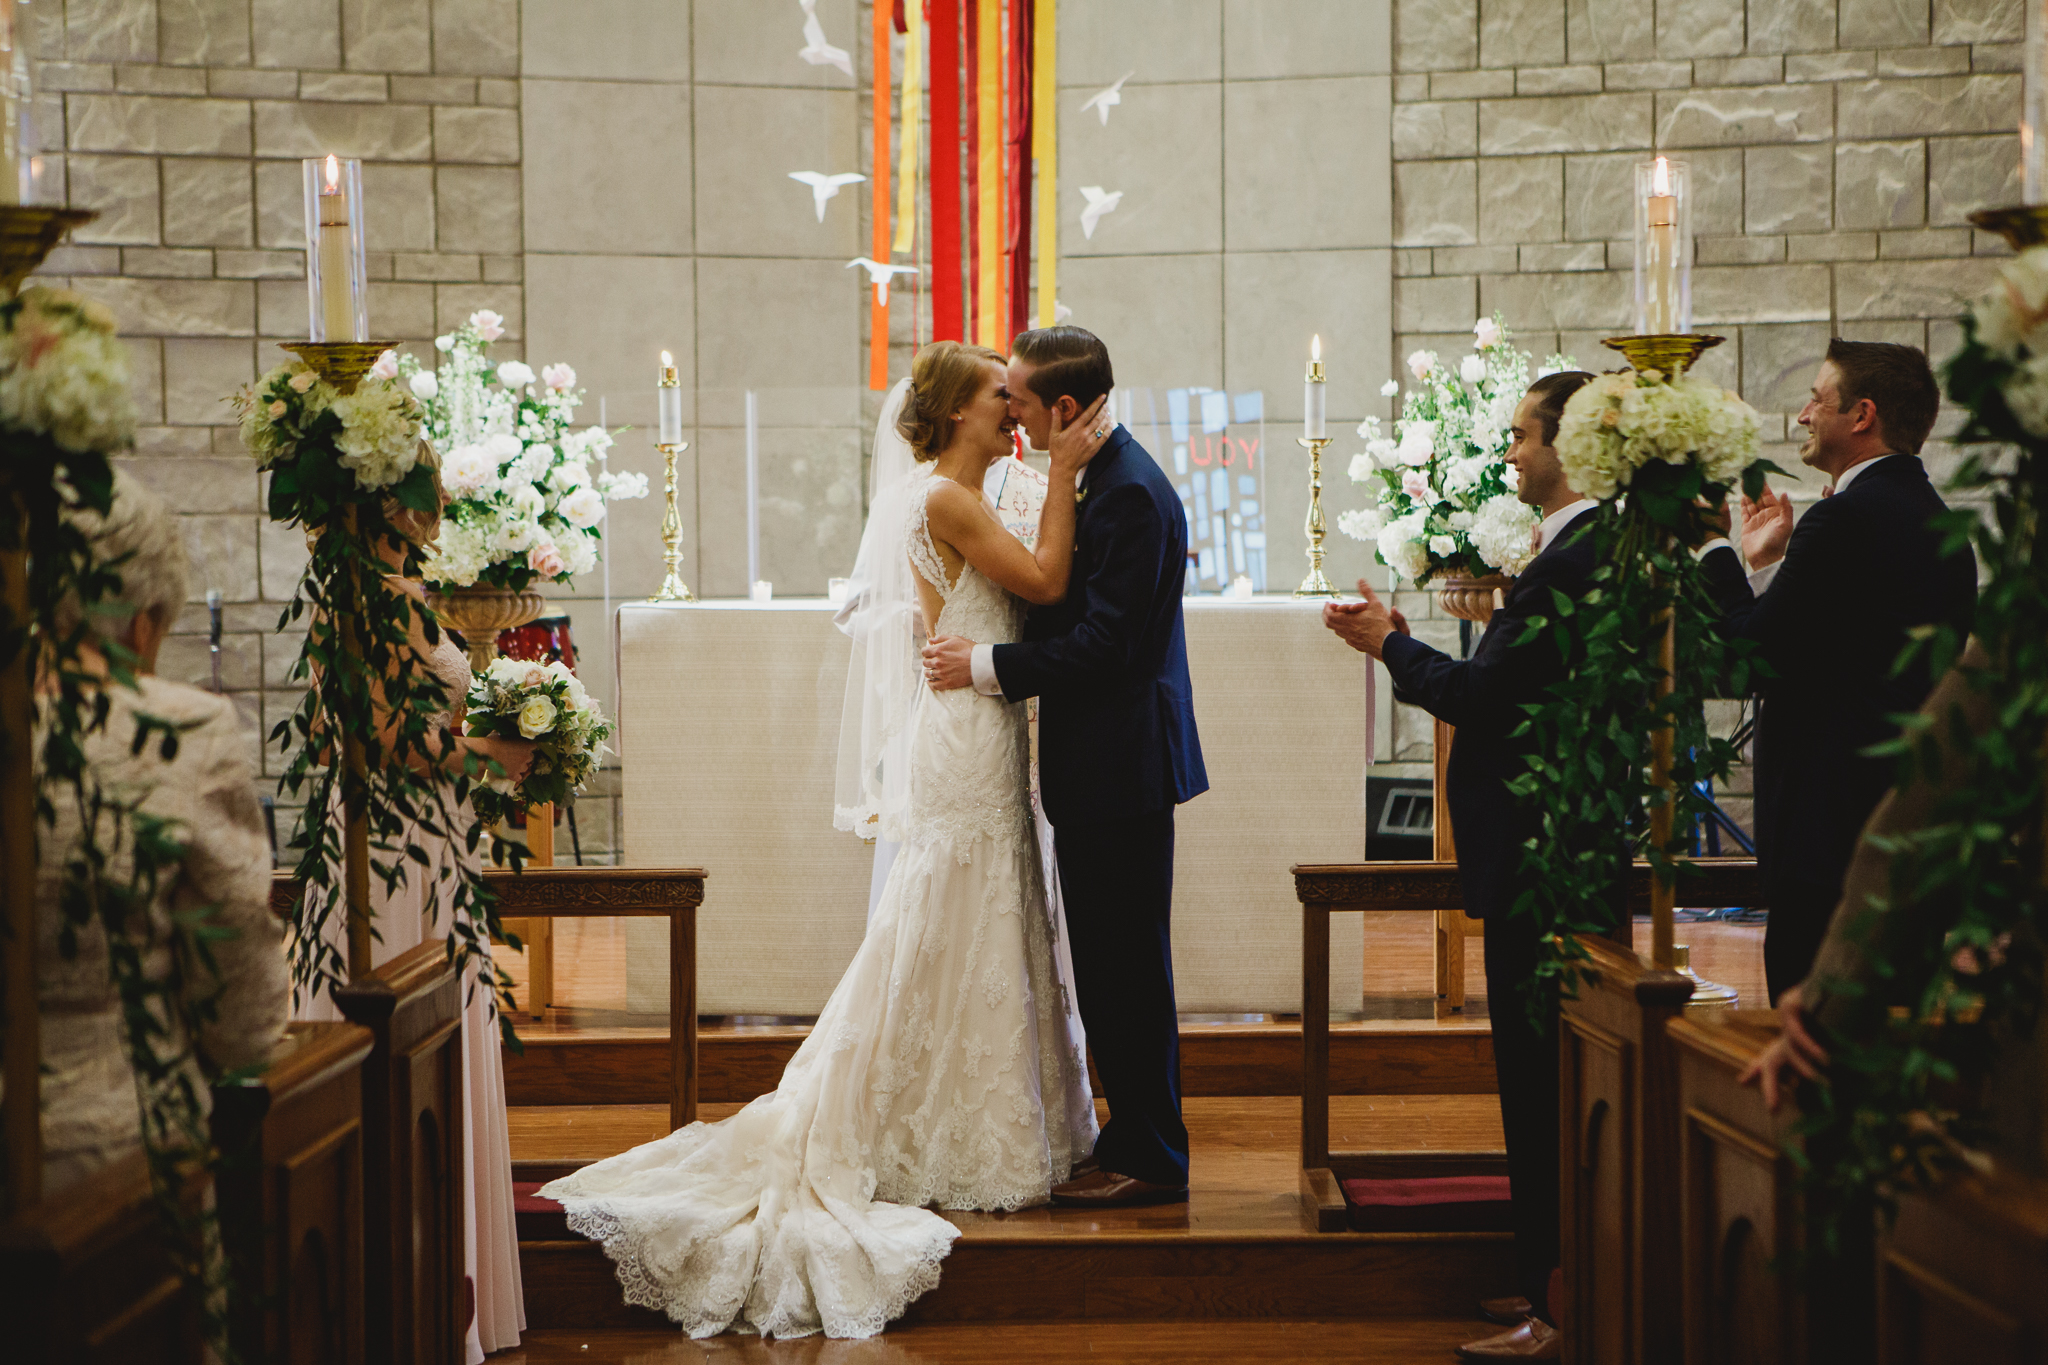 Michael and Kelly - the ashton depot - wedding DFW - wedding photographer- elizalde photography (53 of 150).jpg